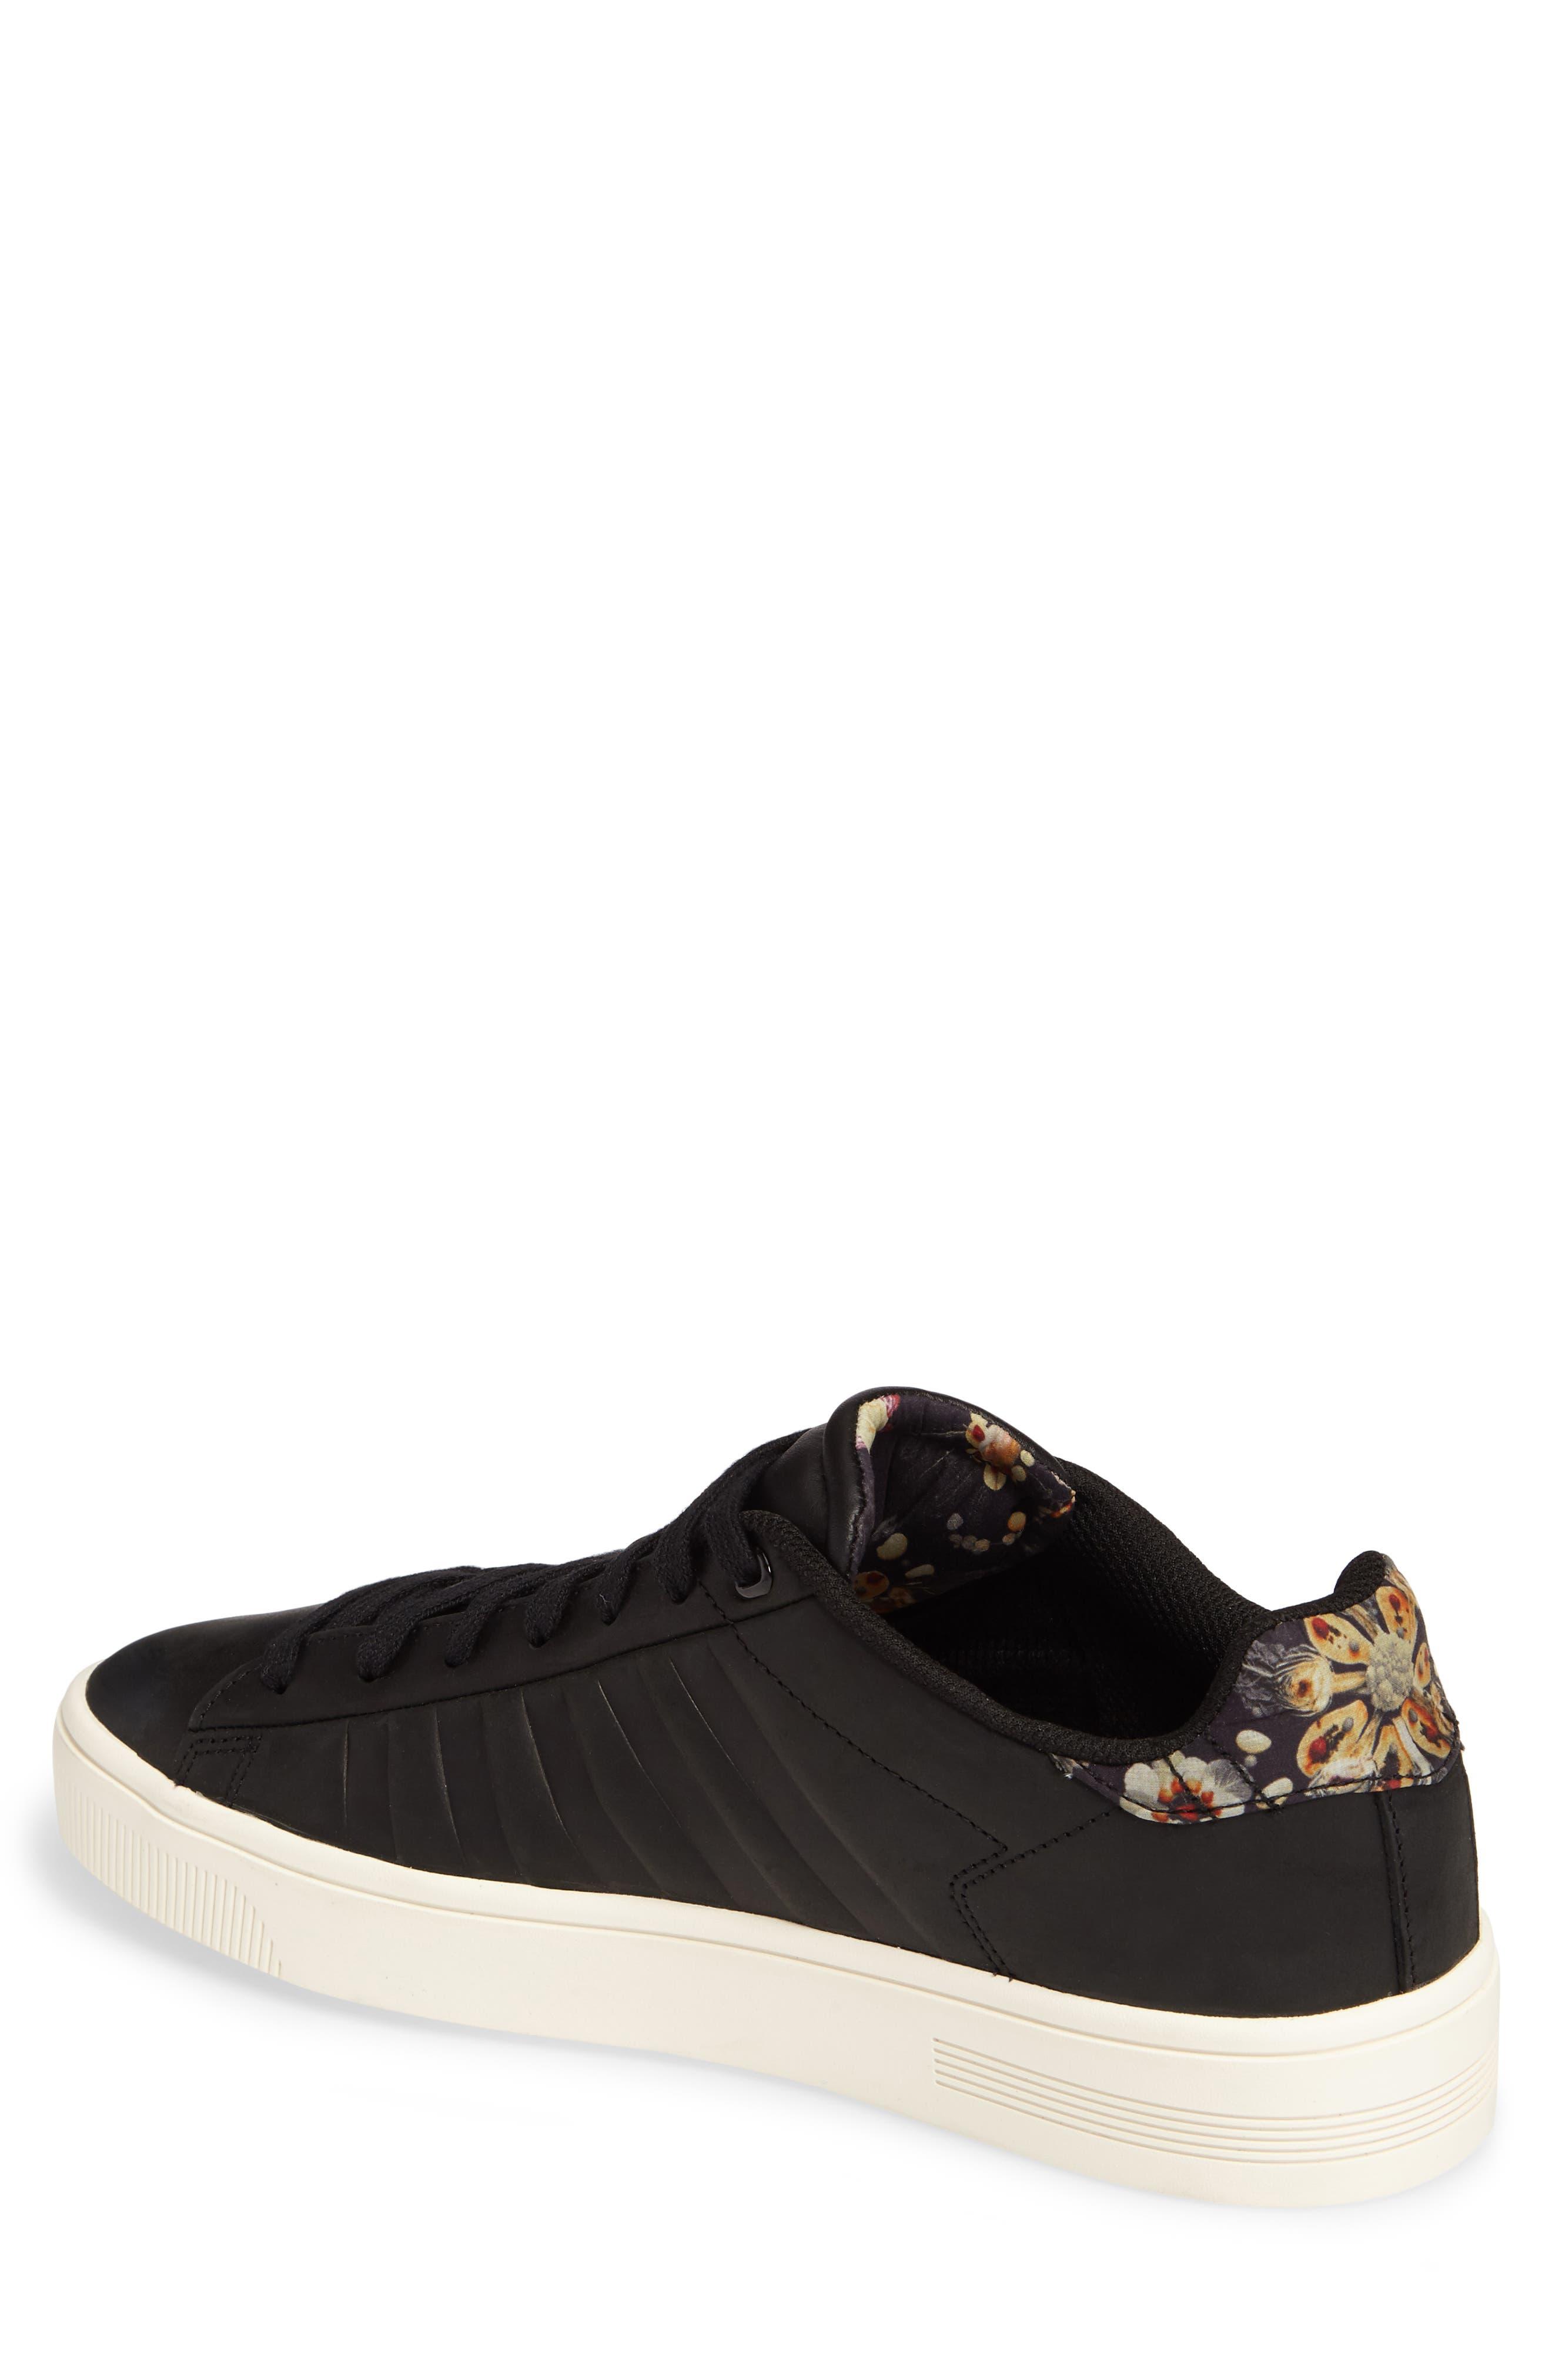 Court Frasco<sup>™</sup> Liberty Sneaker,                             Alternate thumbnail 2, color,                             001